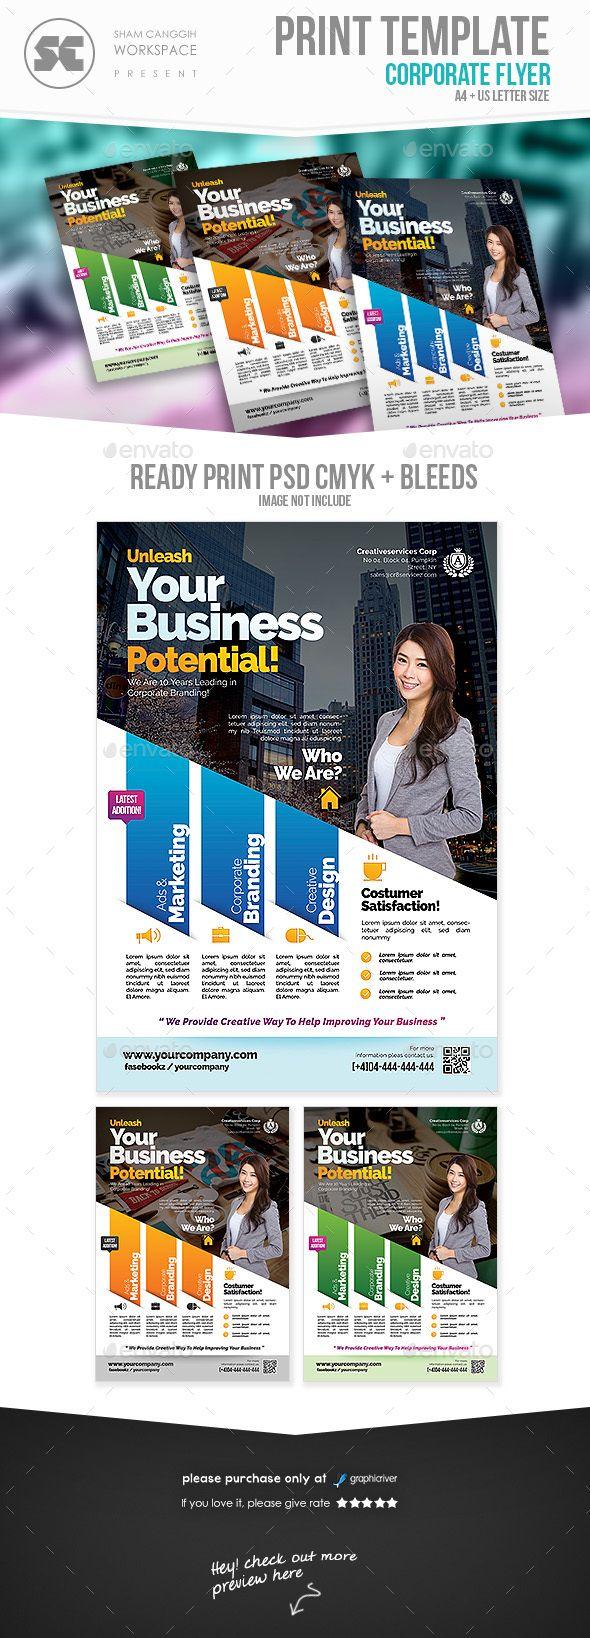 best ideas about business flyer templates business flyer business flyer template psd